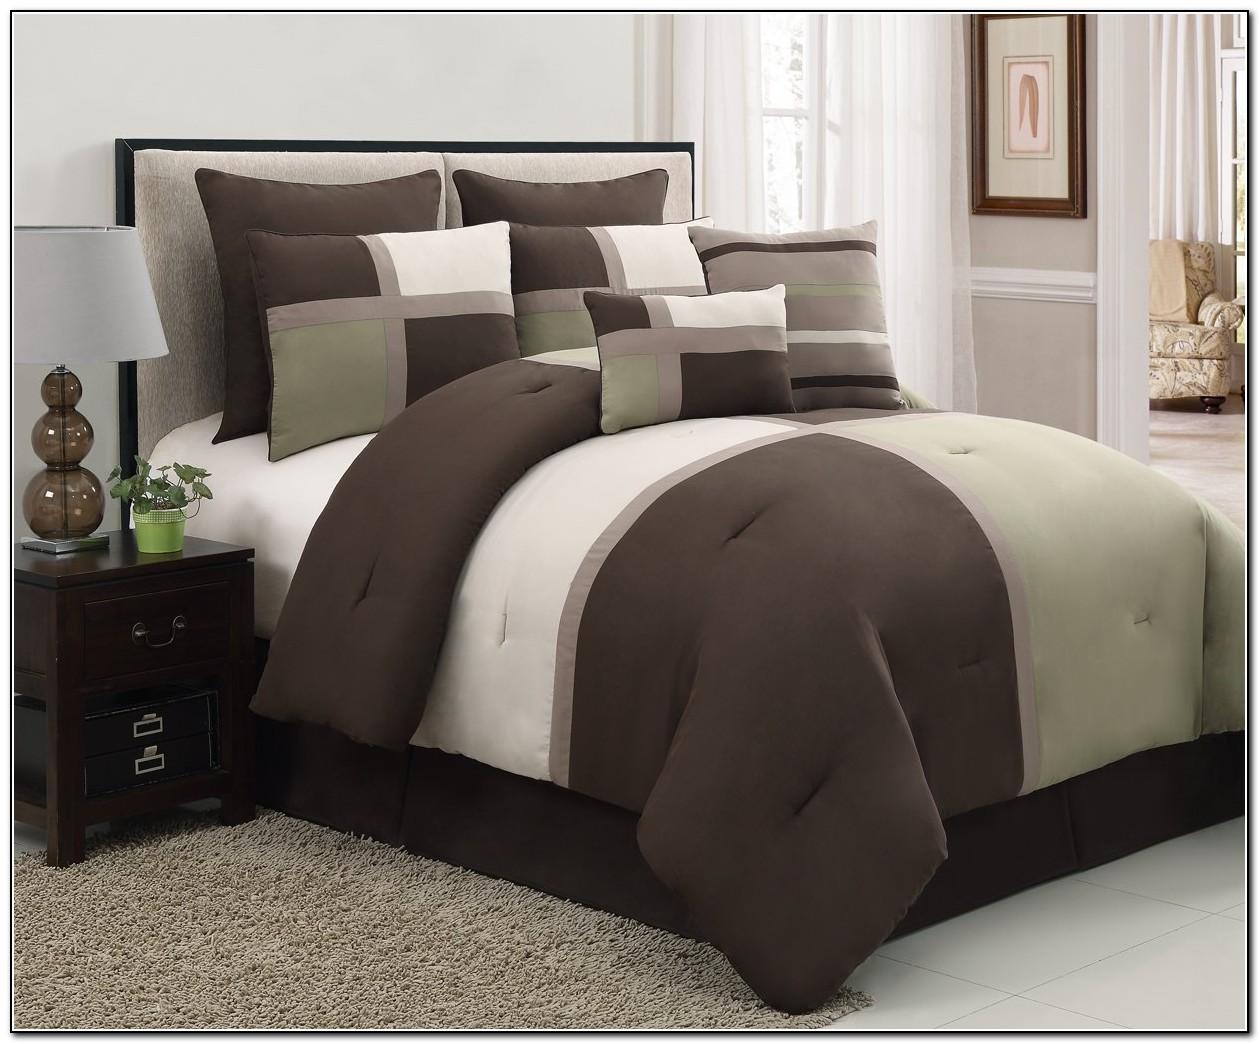 Queen Size Bed Sets For Men